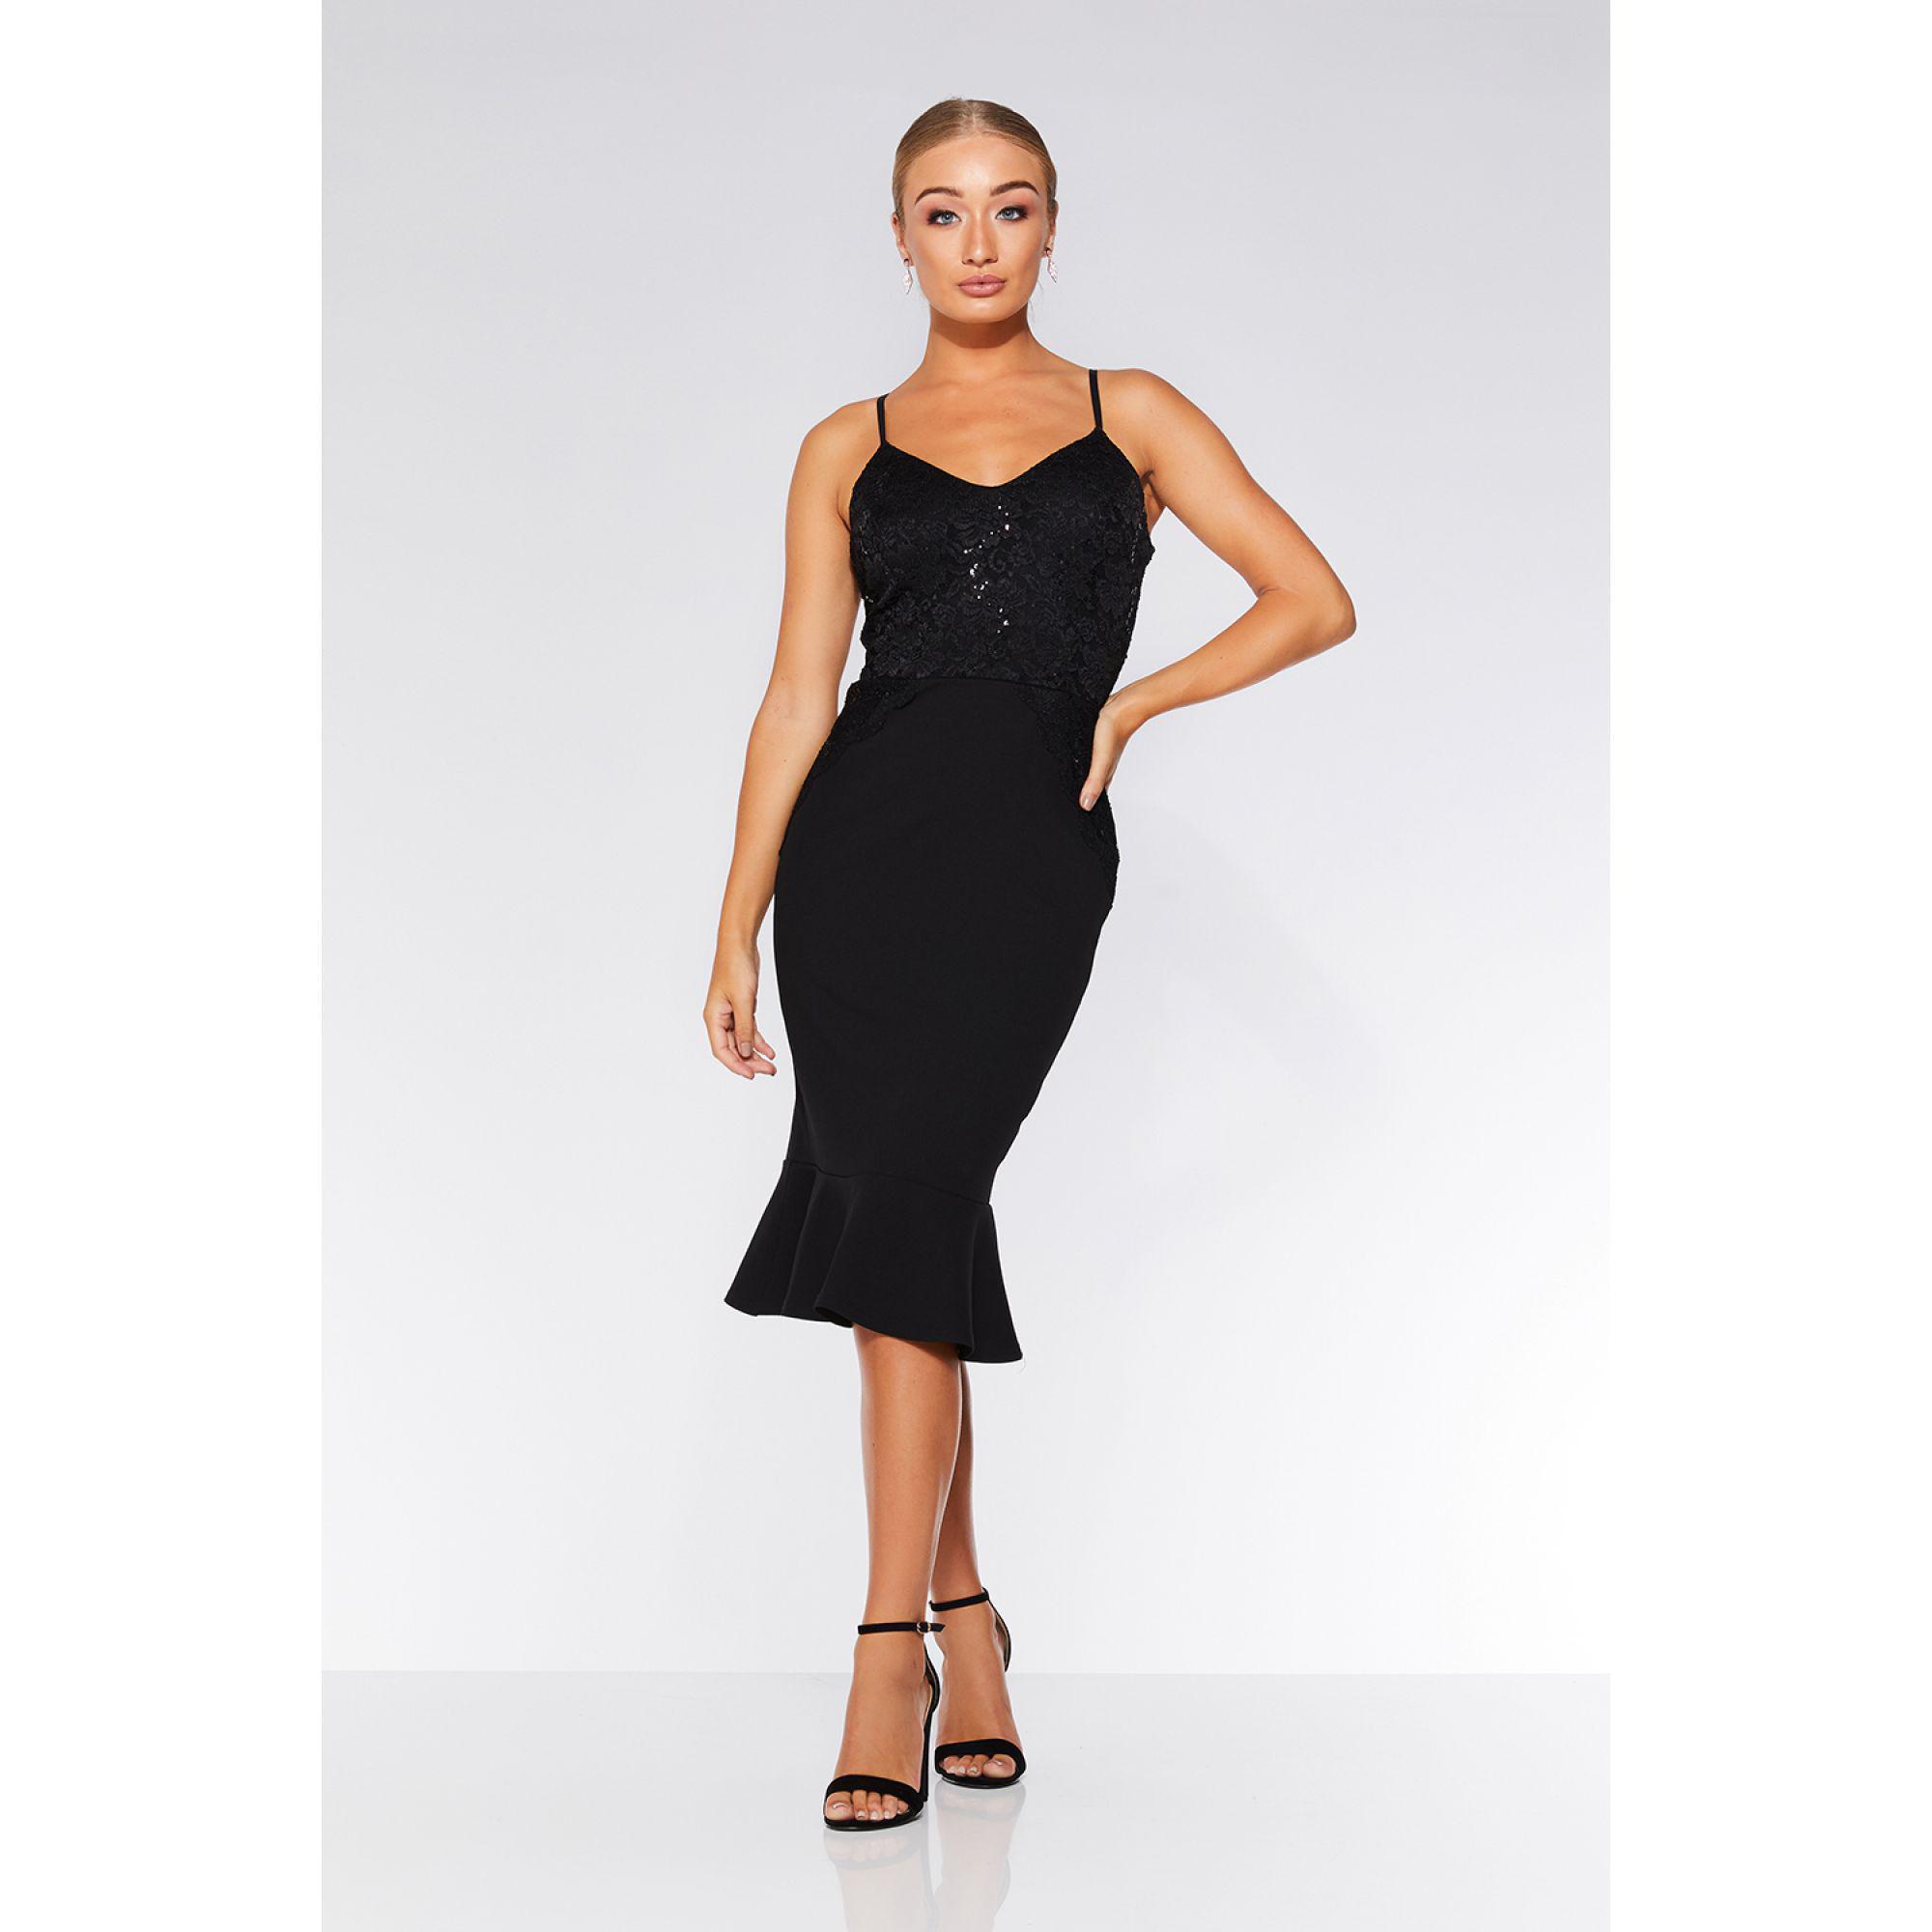 7a4dbf997df7 Quiz Black Sequin Lace Frill Midi Dress in Black - Lyst